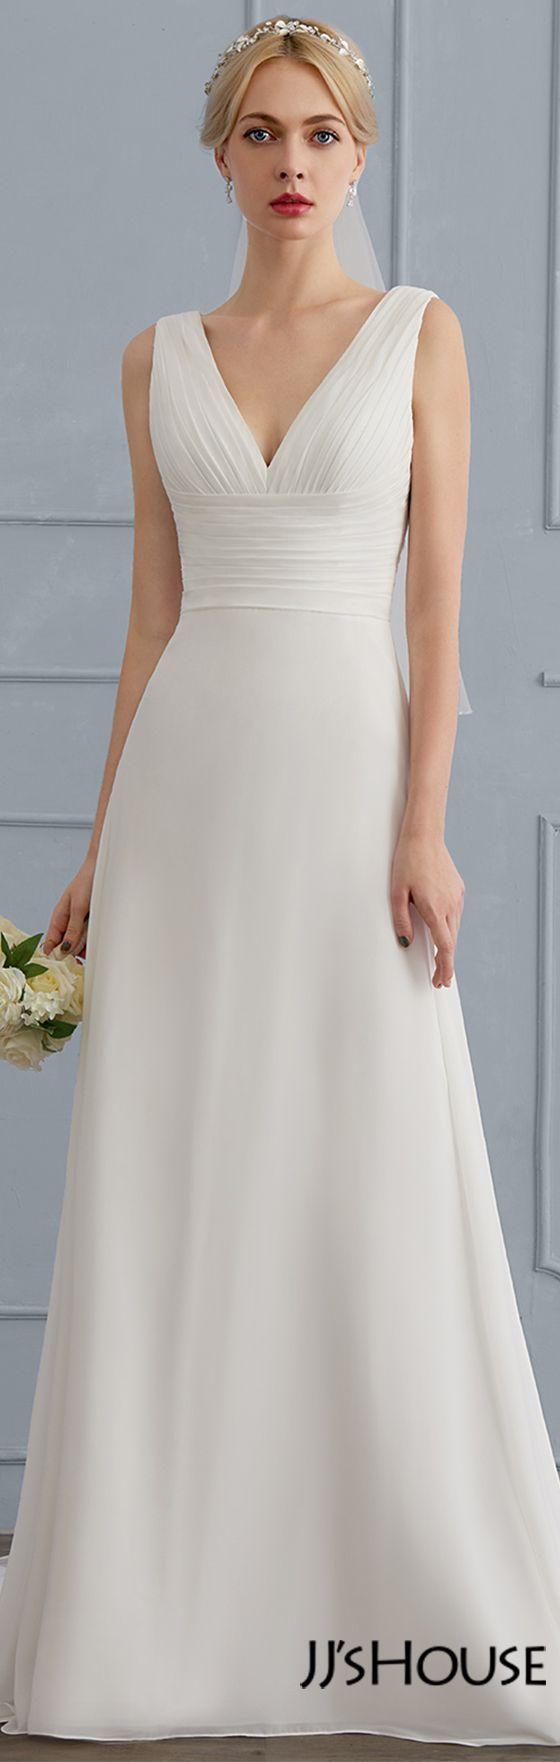 JJsHouse #Hochzeitskleider - Brautkleider prinzessin i 18